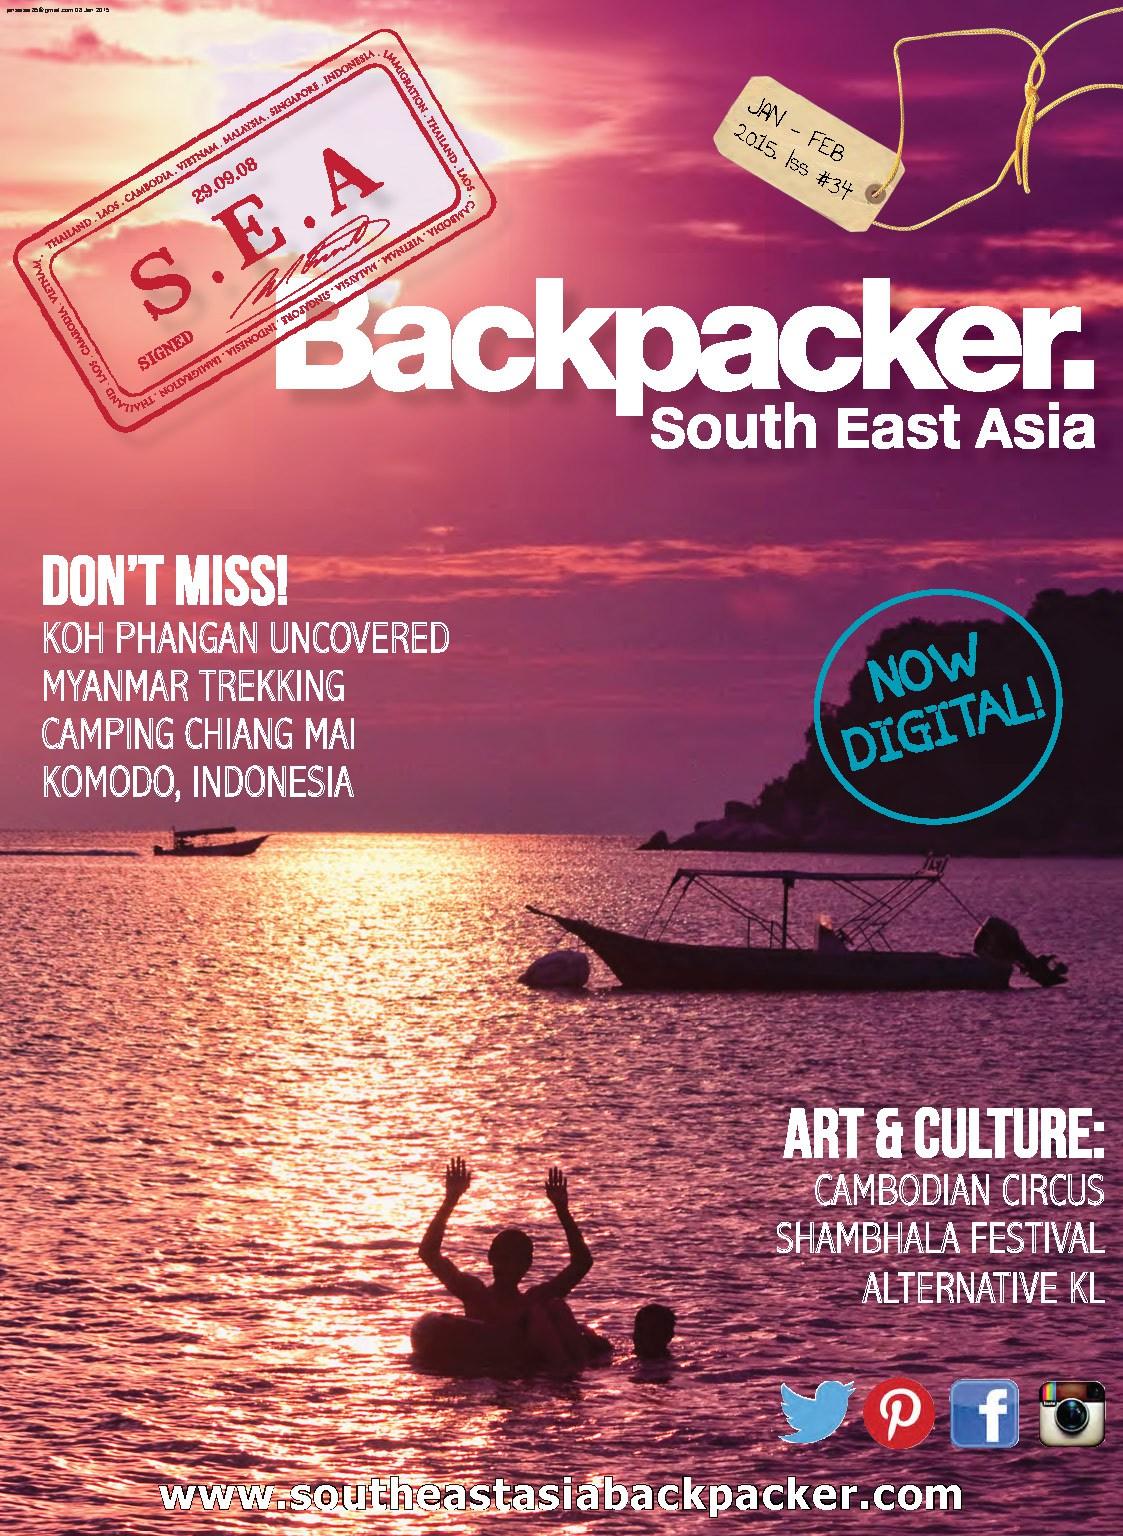 Jen-Seiser-South-East-Asia-Backpacker-Magazine-Cover.jpeg